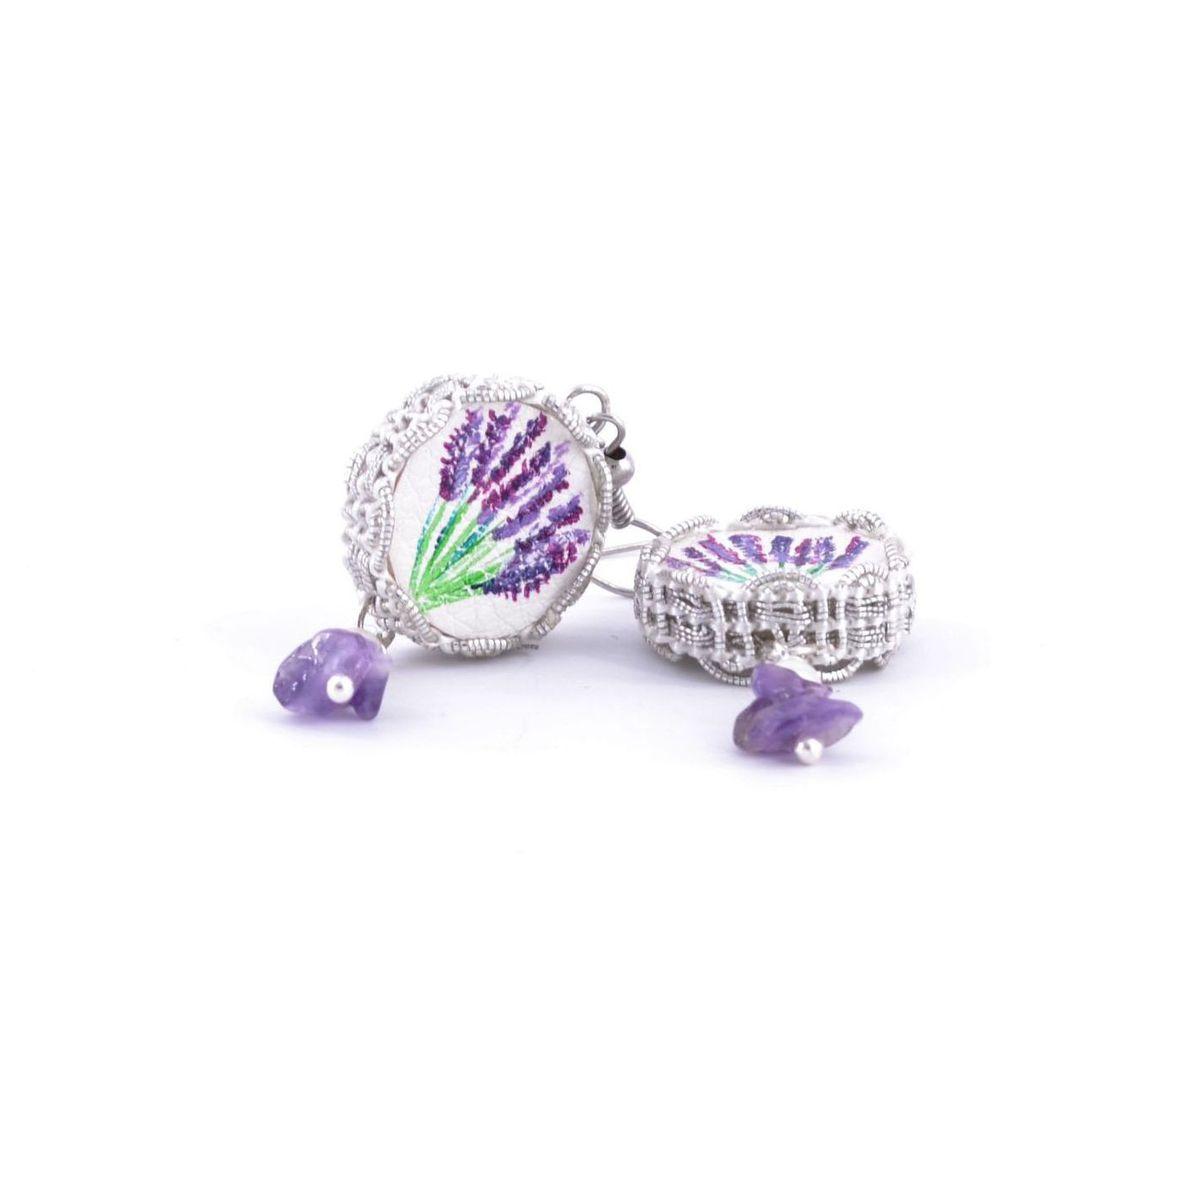 Tambourine Lavender Mum Earrings Violet Tataratà Bijoux